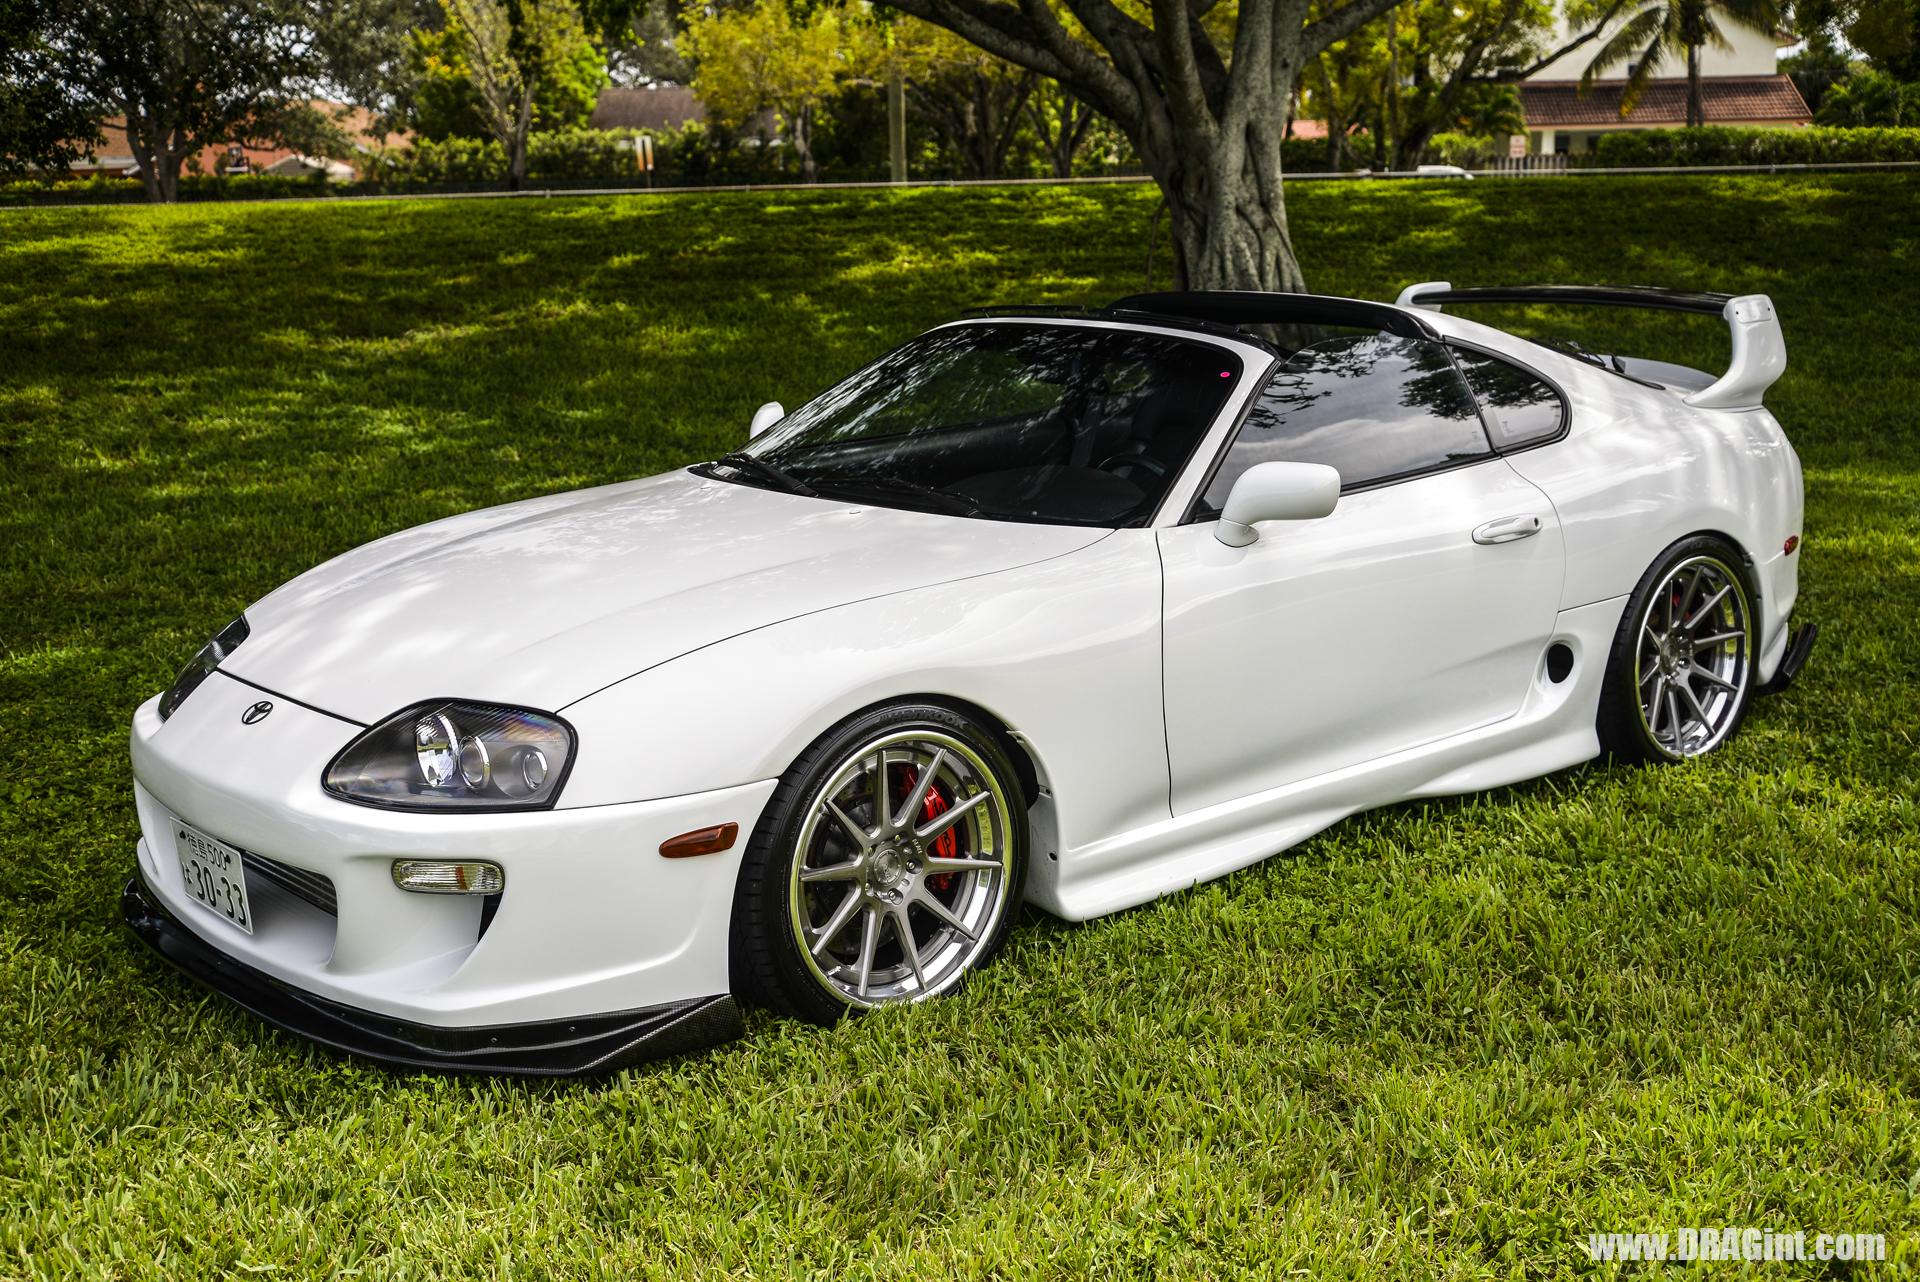 DRAGint.com Project White Heat – Supra Turbo 6 Speed + JDM ...